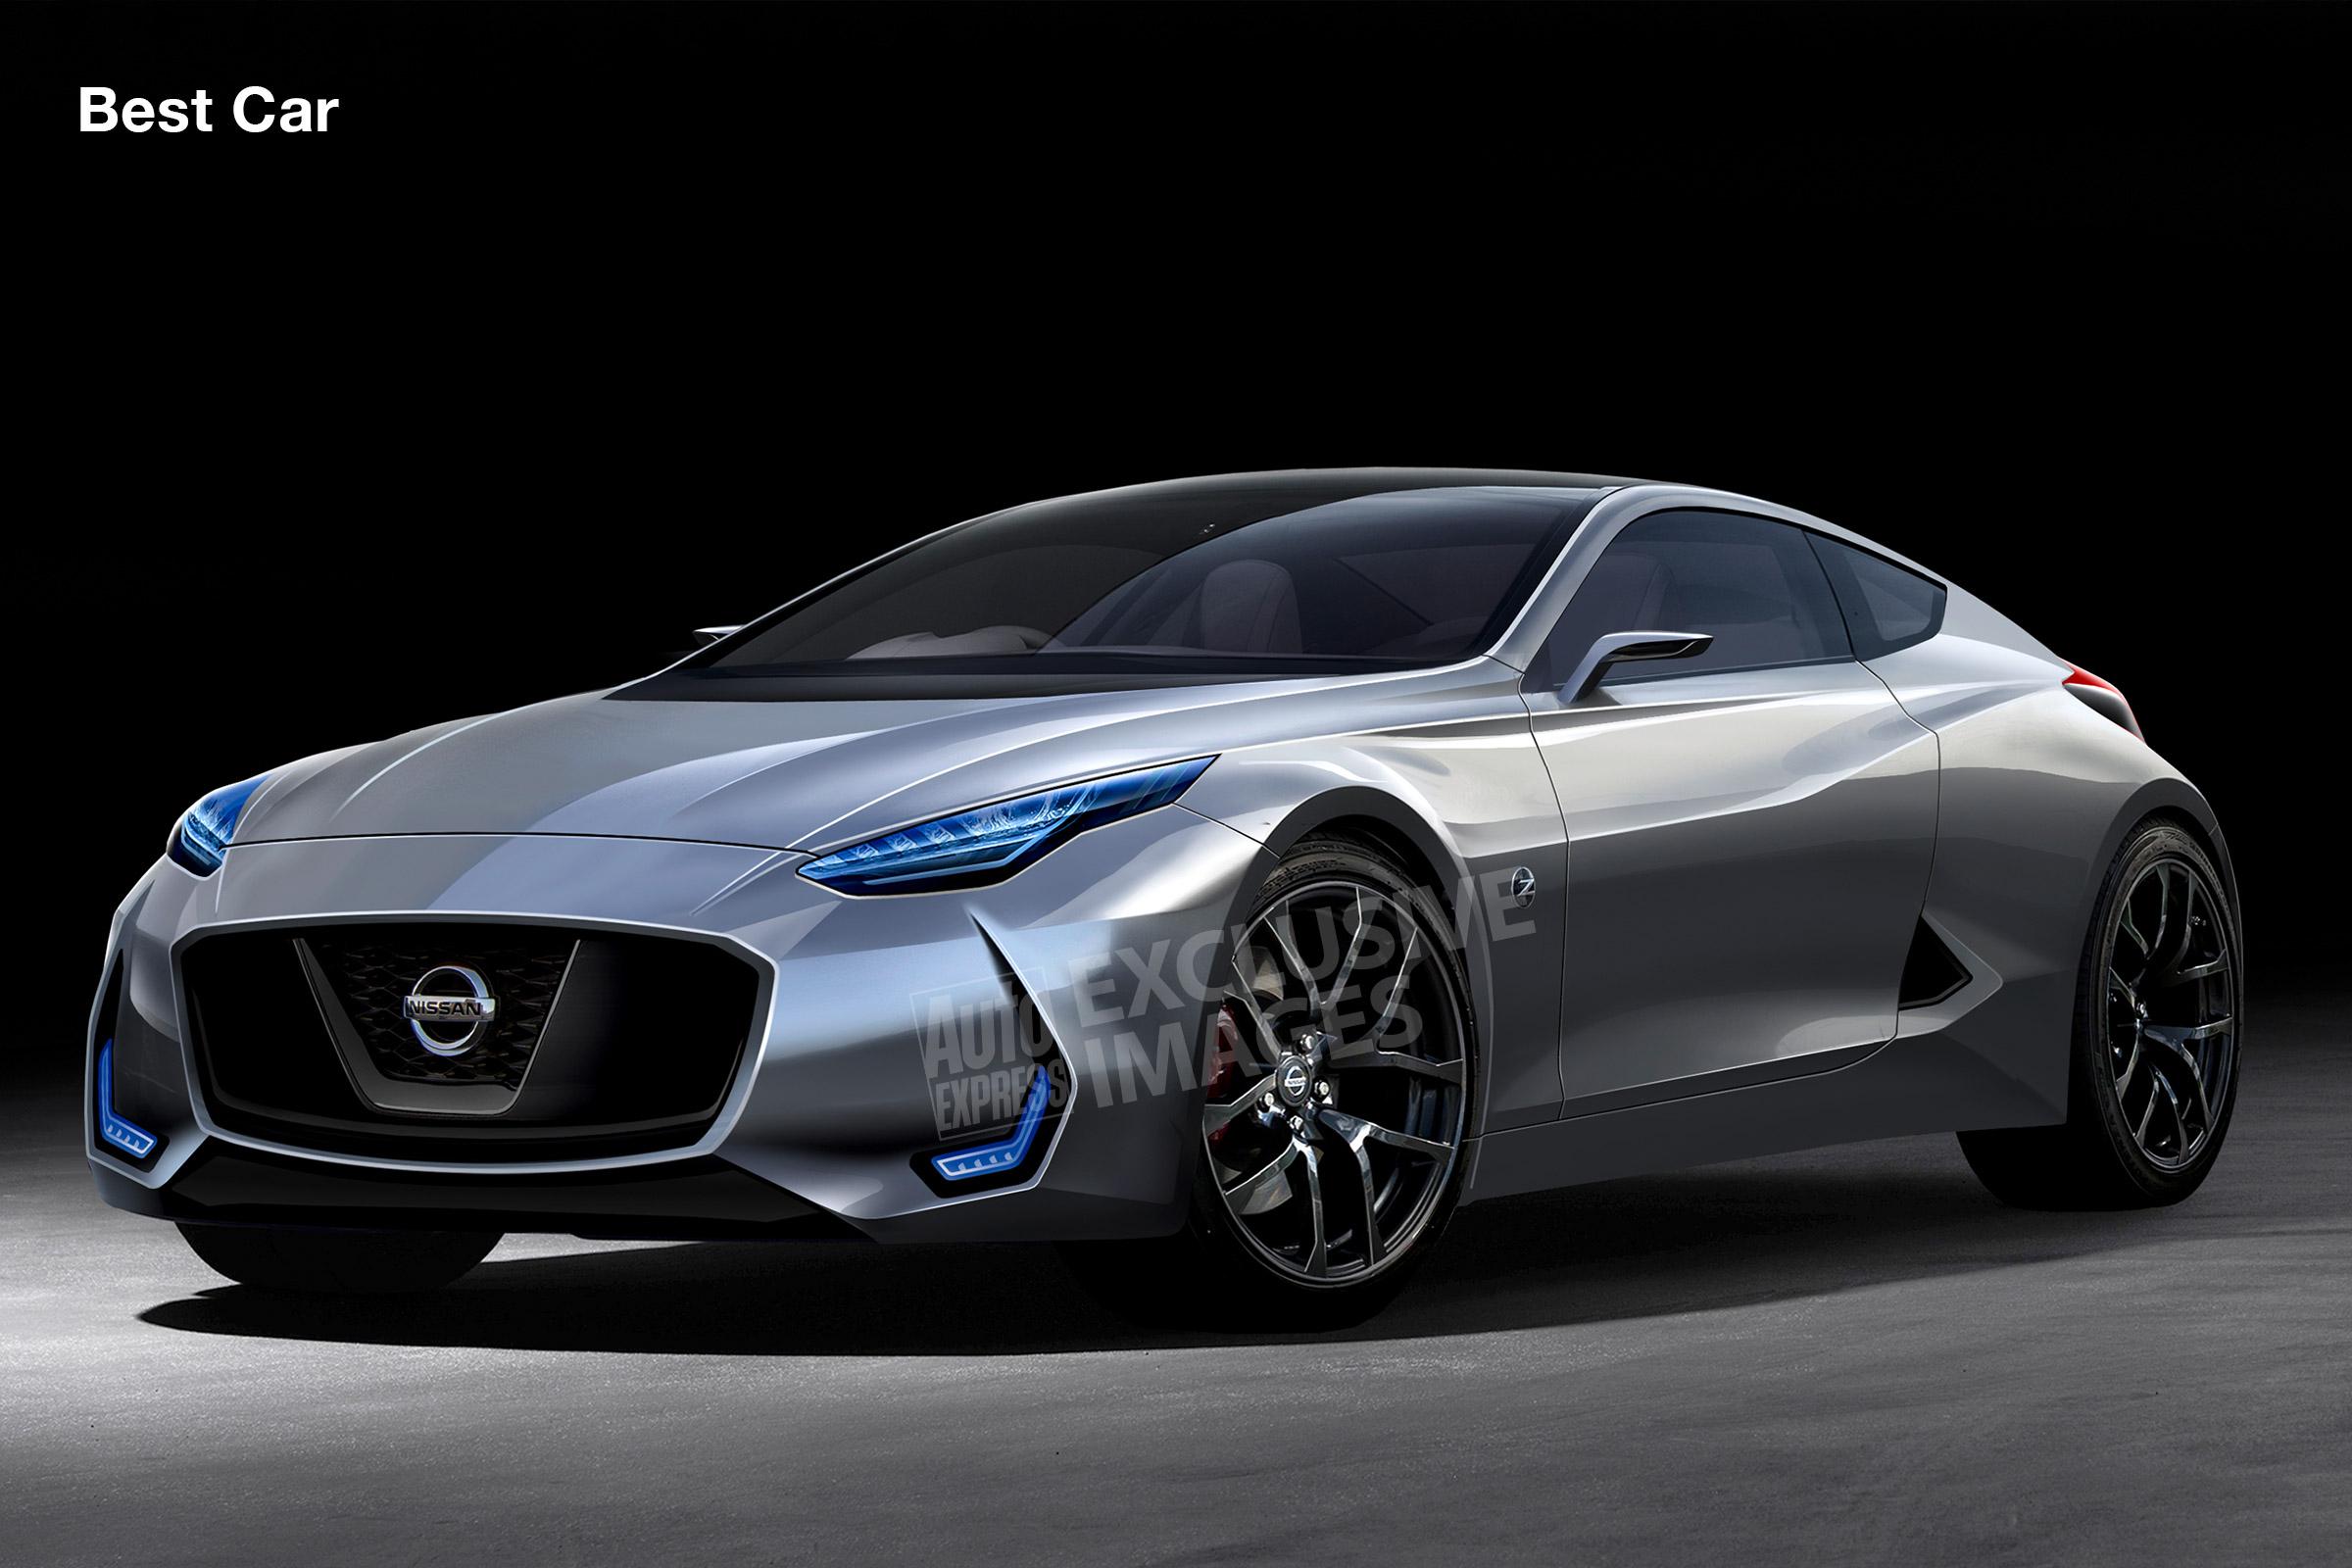 nissan z35 concept tokyo 370z 400z render motor cars release date interior gt 2400 appear go visit club autoexpress